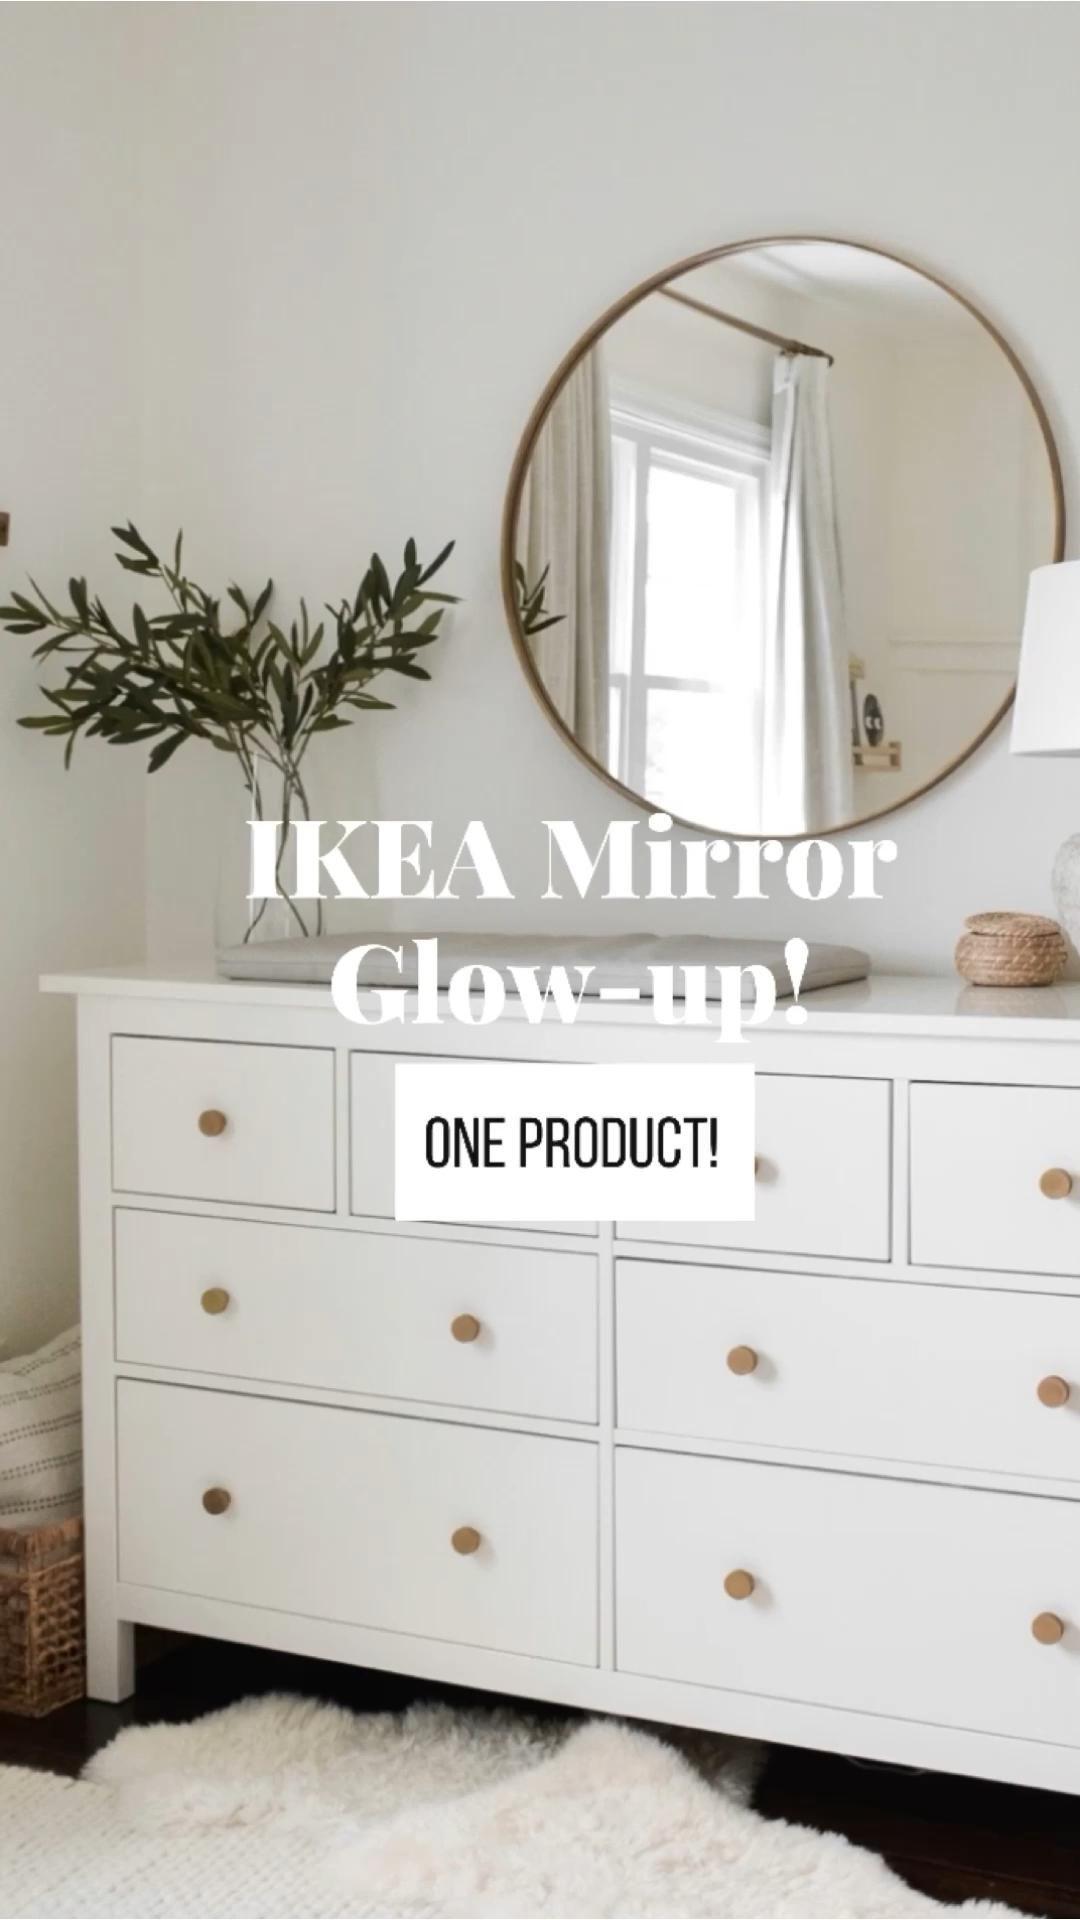 IKEA Mirror Glow-up in 1 step!